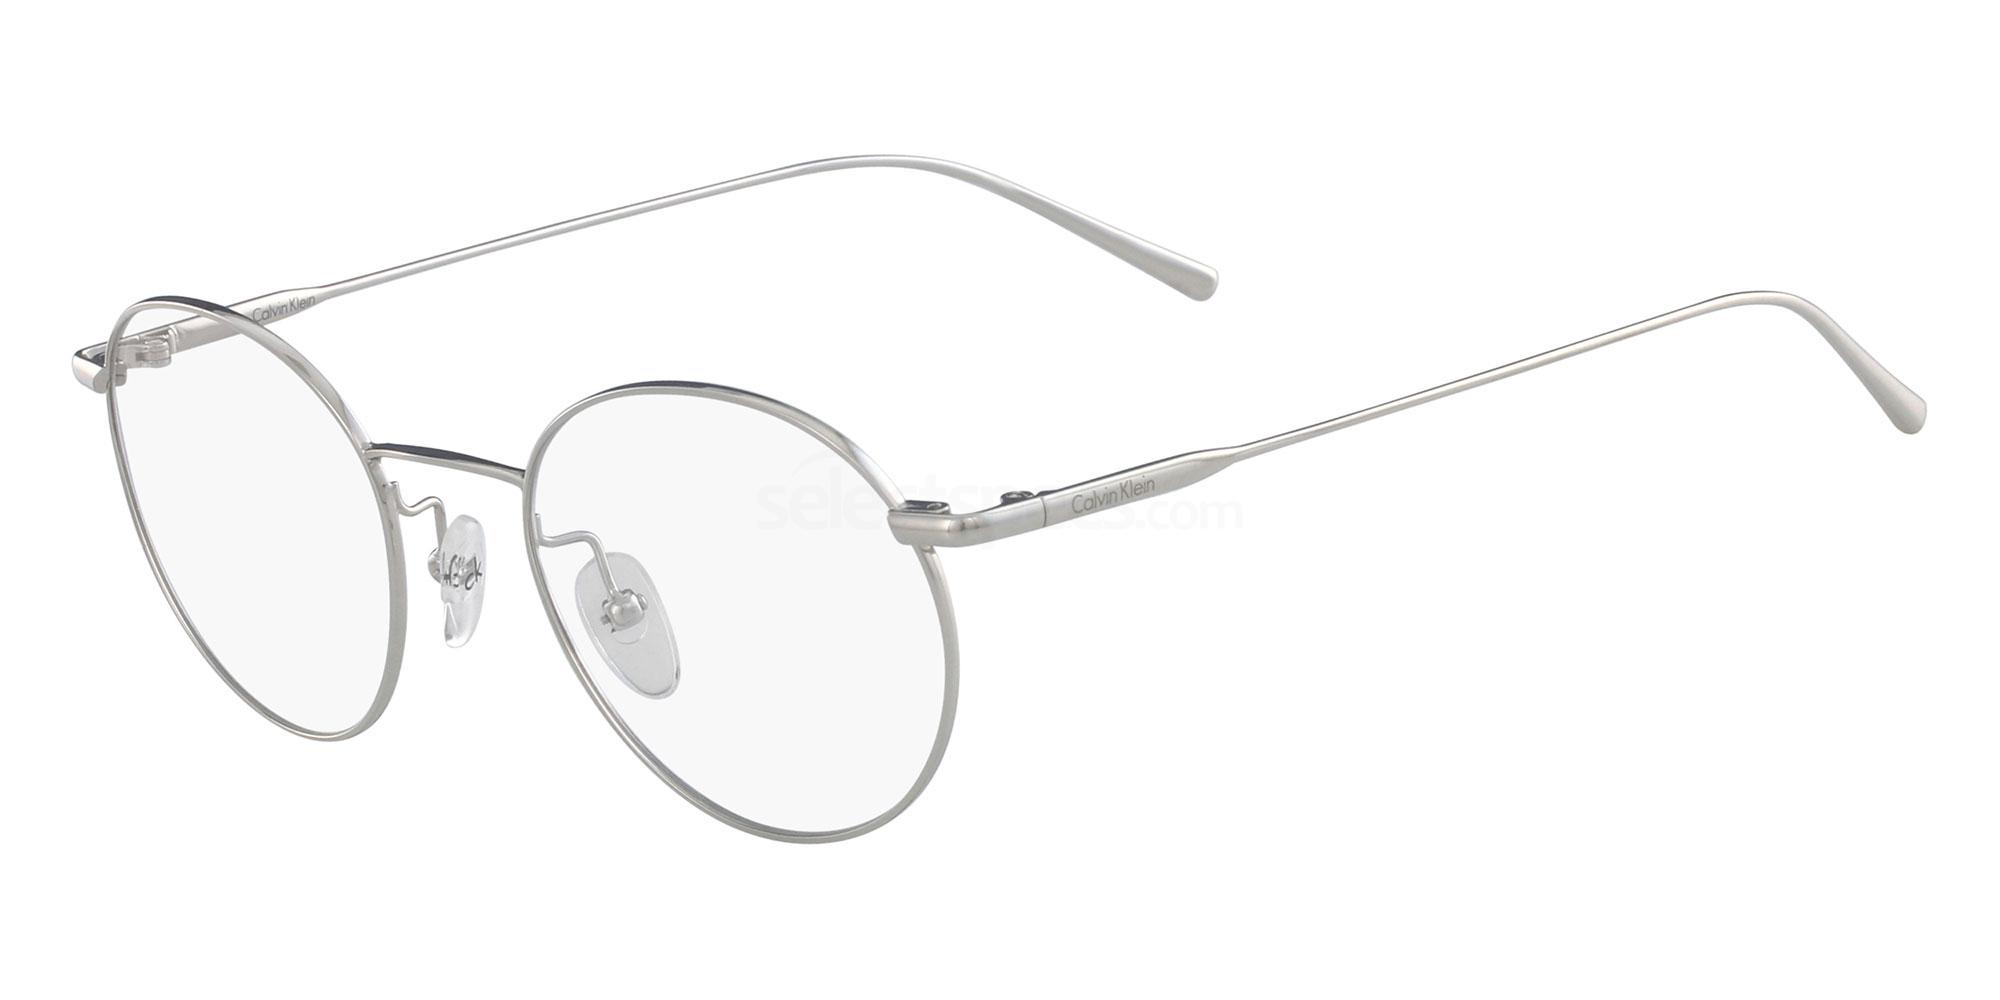 046 CK5460 Glasses, Calvin Klein